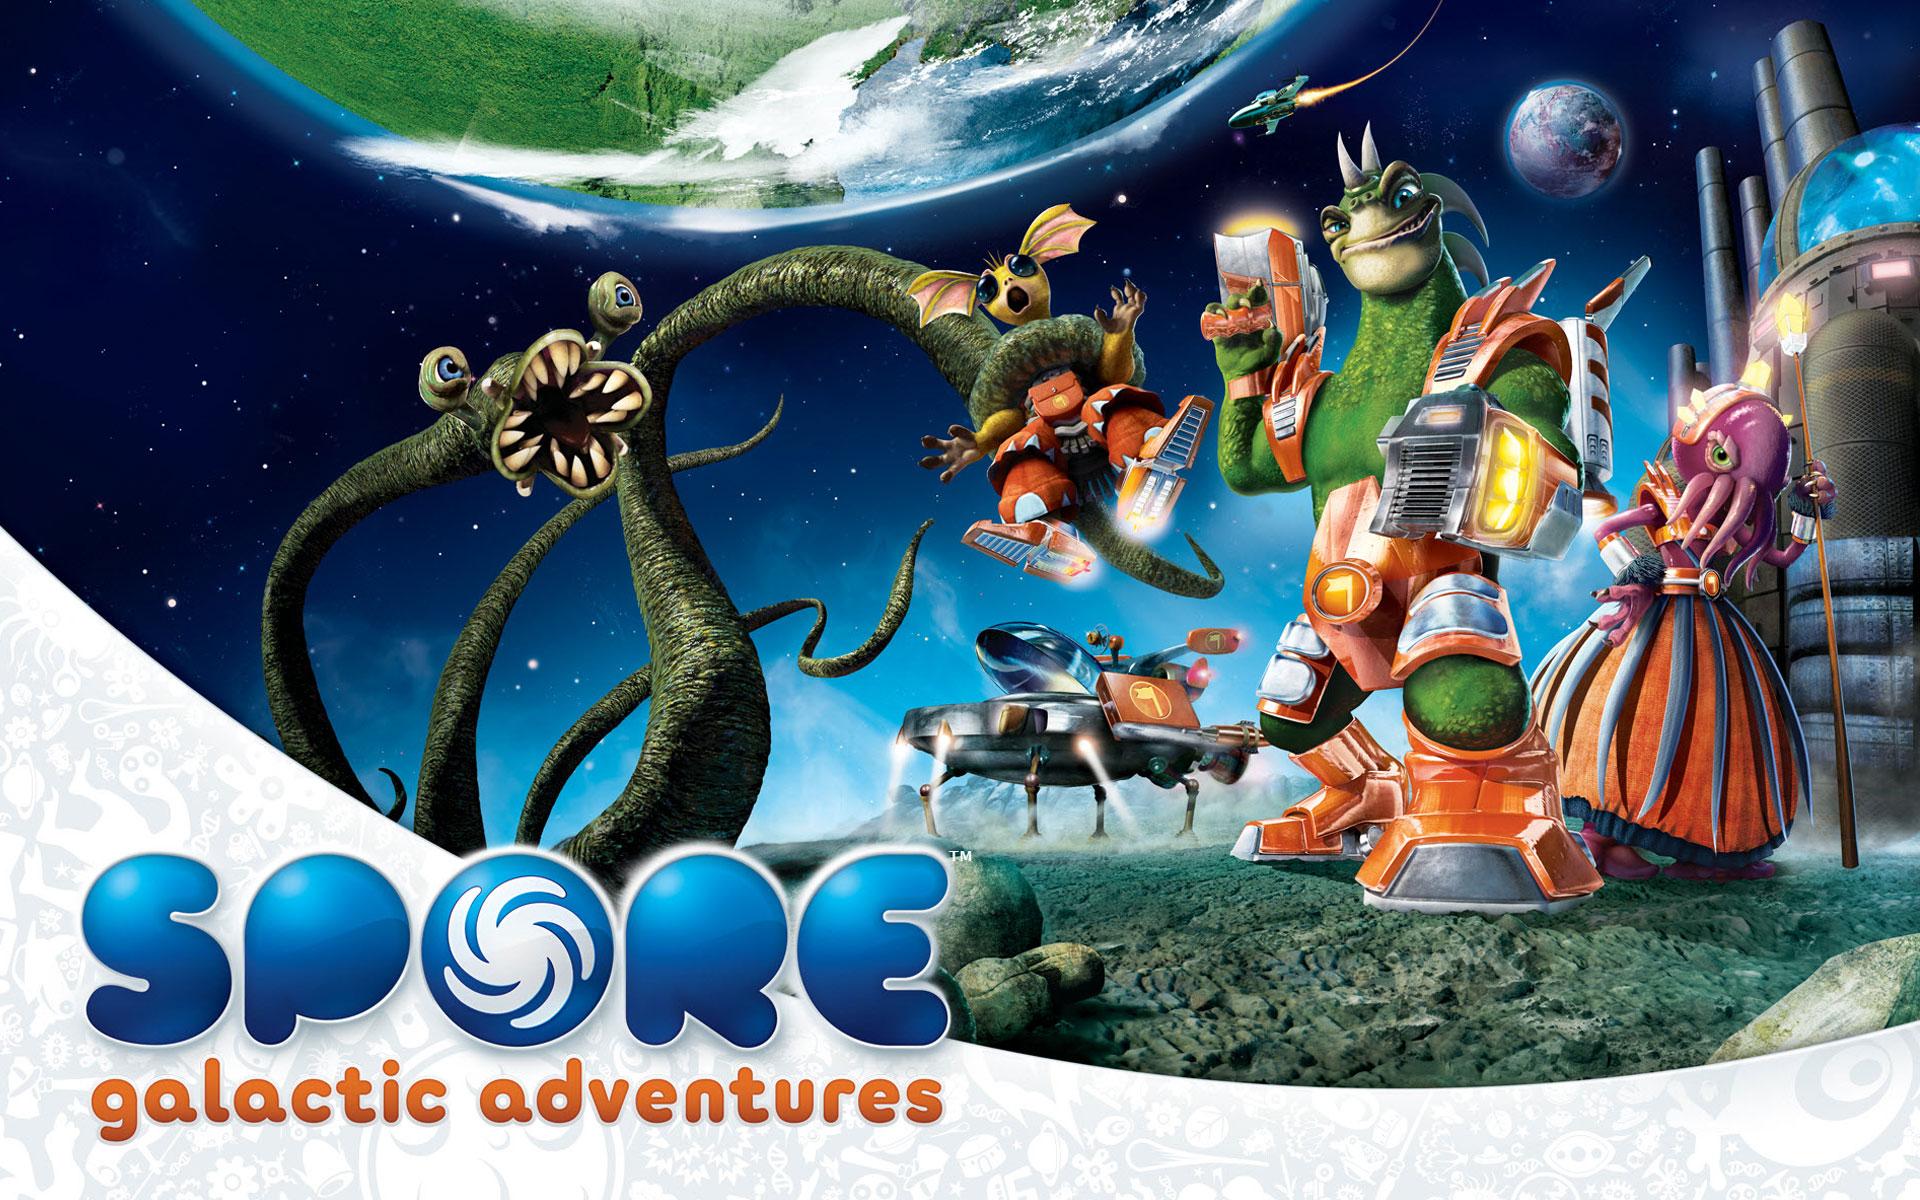 Spore galactic adventures game hd wallpaper - Spore galactic adventures wallpaper ...